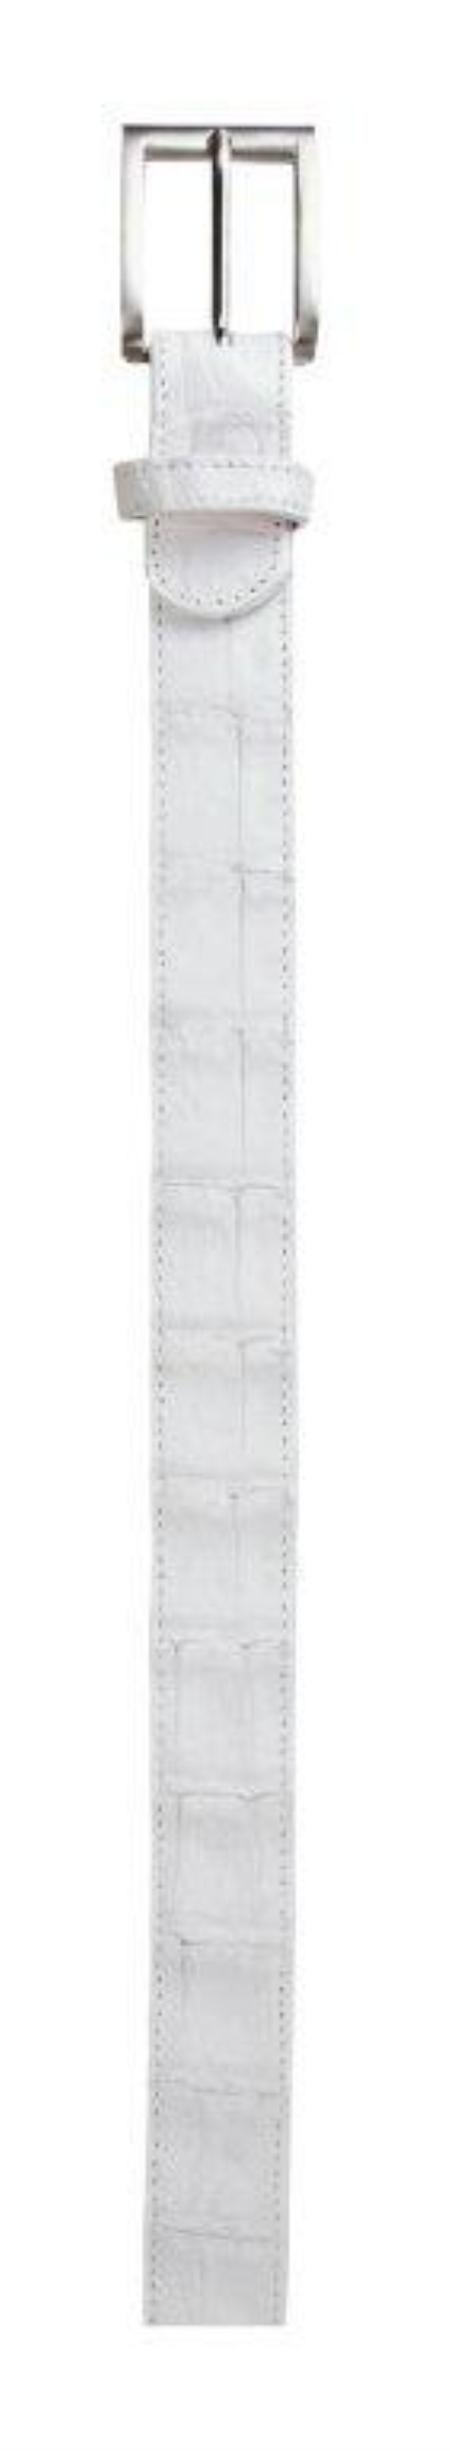 White-Gator-Skin-Belts-11775.jpg